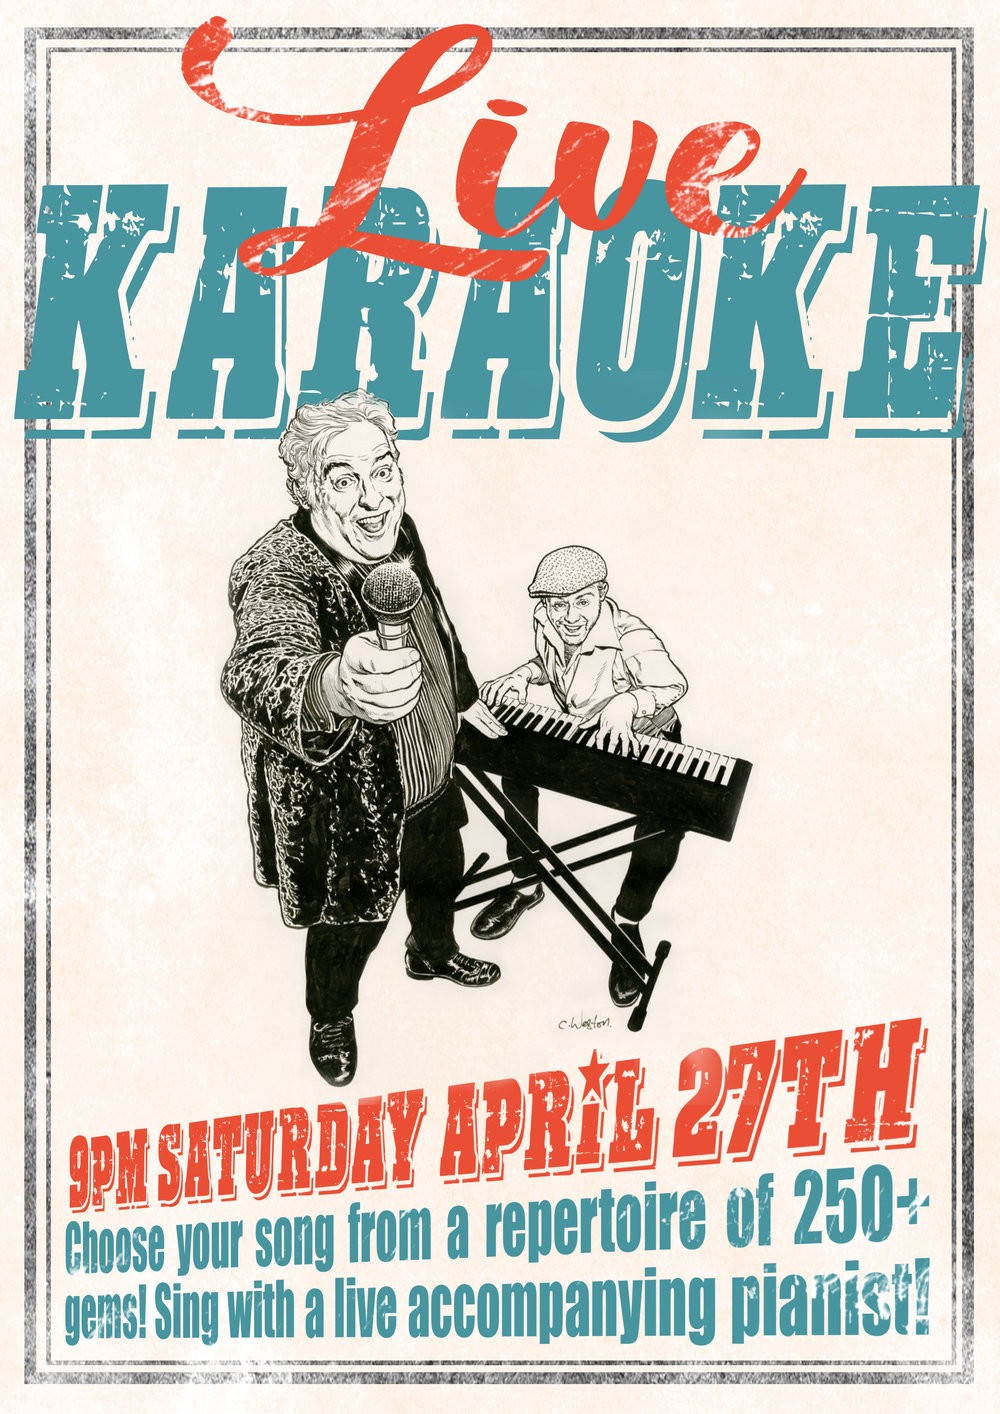 karaoke2forweb.jpg